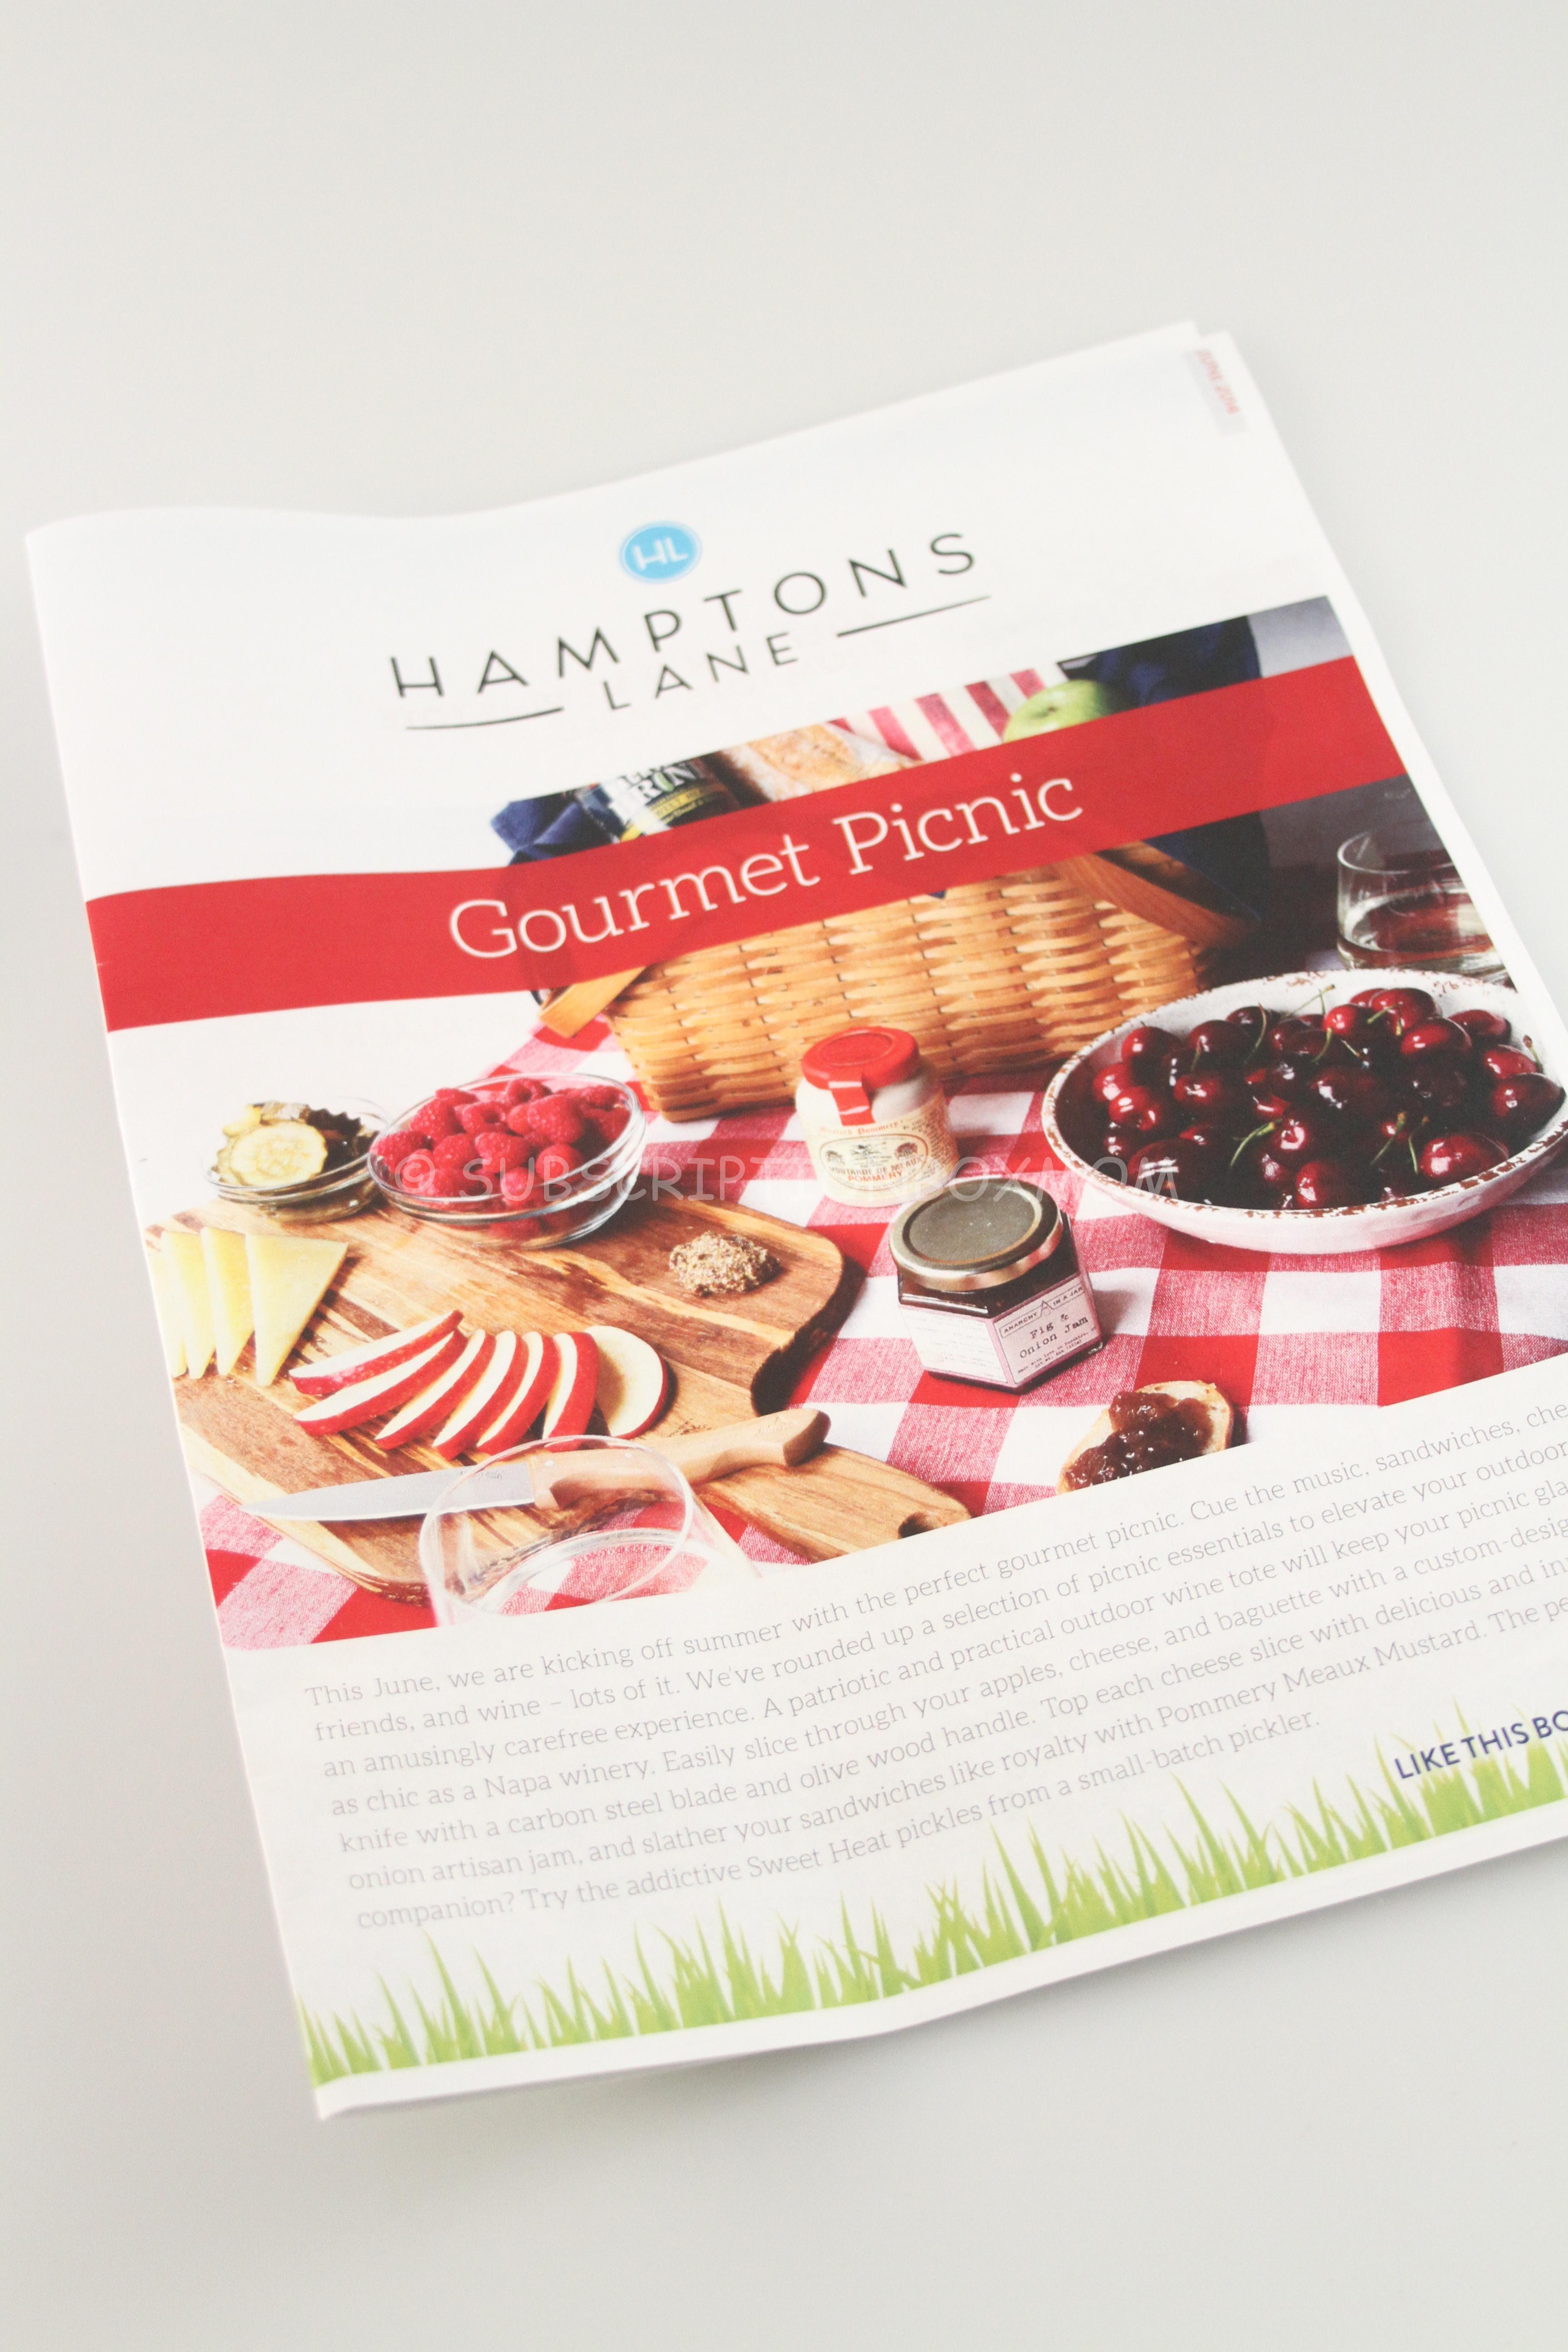 Hamptons Lane June 2014 Review Ten Dollar Coupon